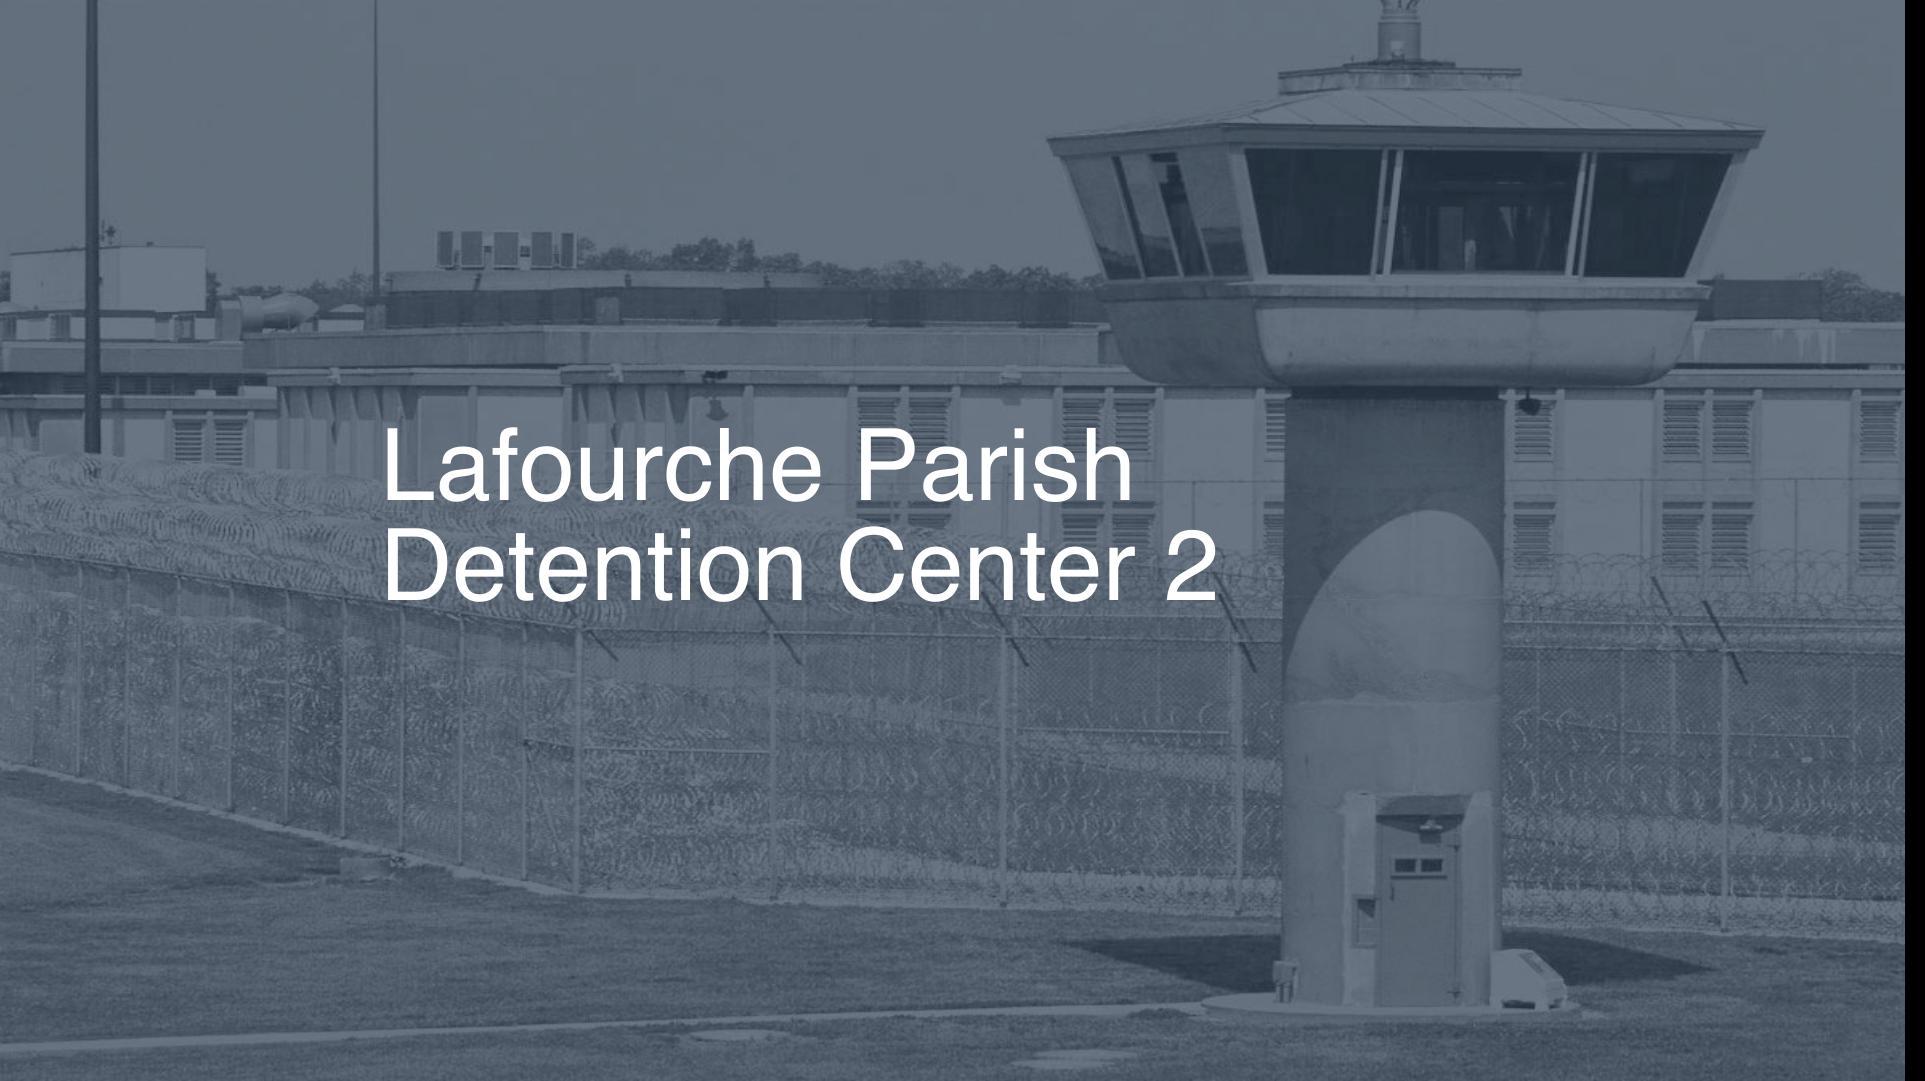 Lafourche Parish Detention Center correctional facility picture